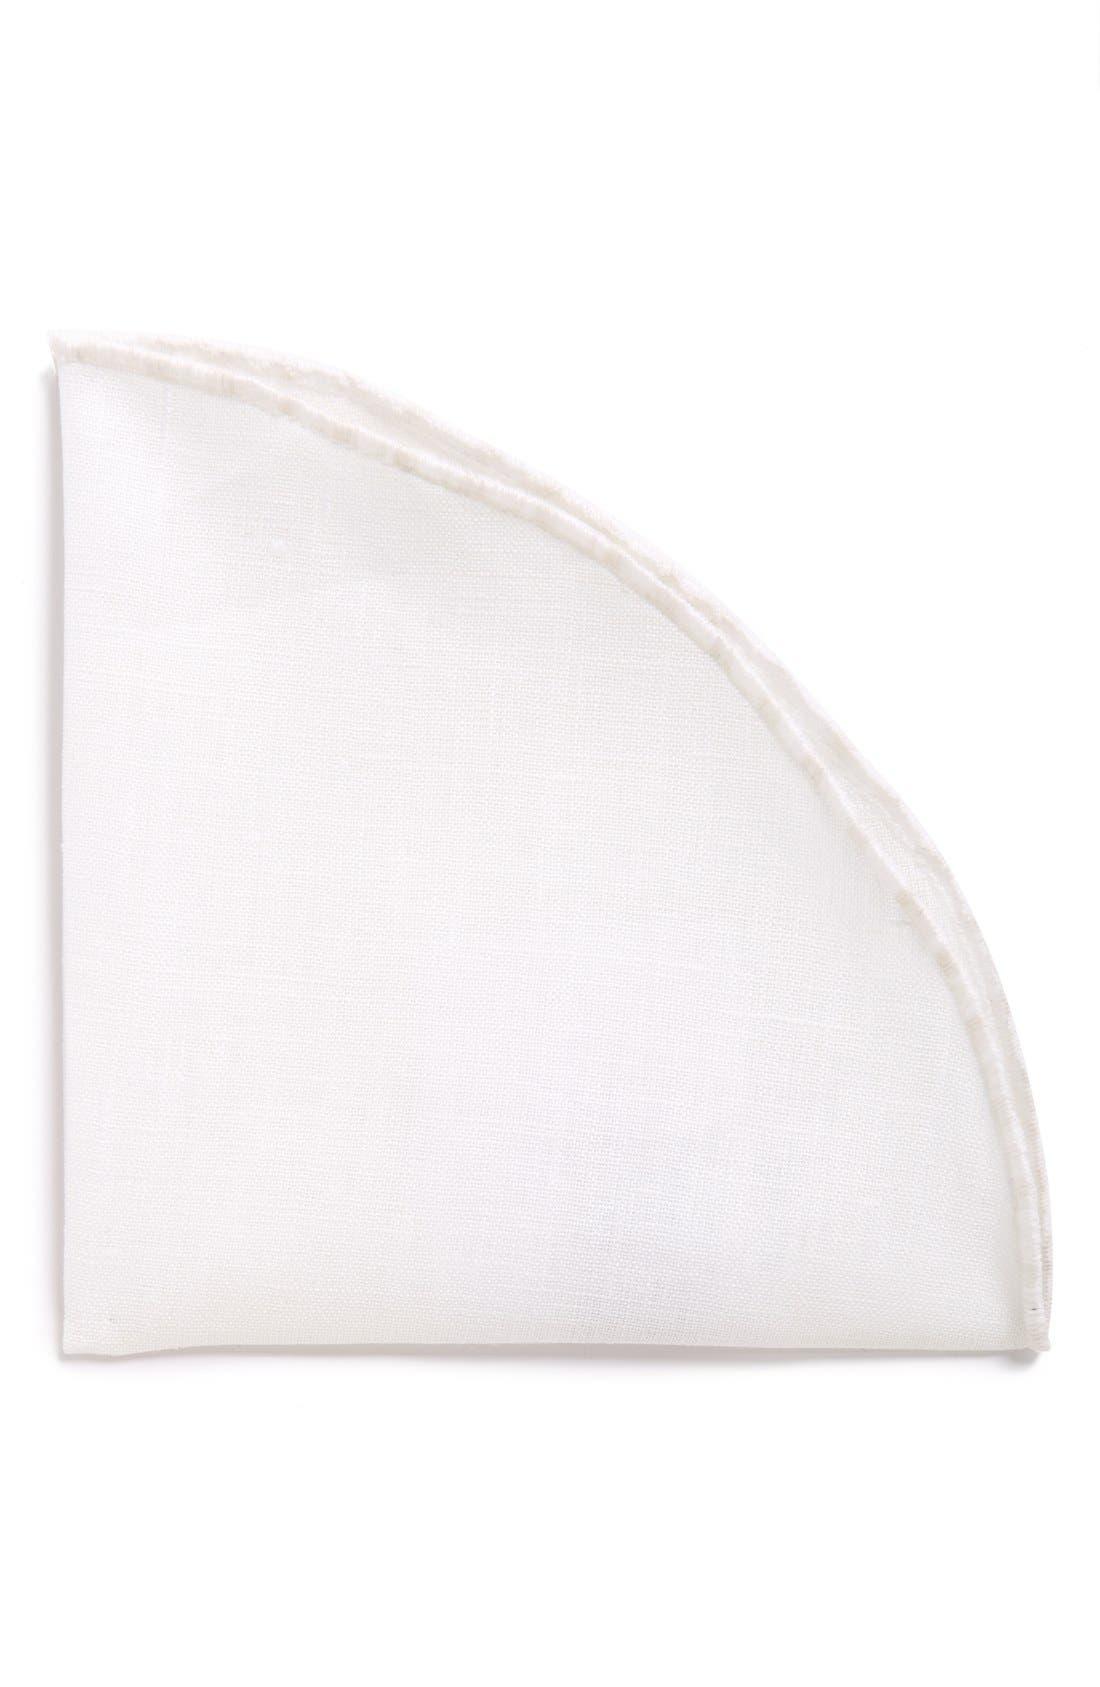 Linen Pocket Round,                         Main,                         color, 100